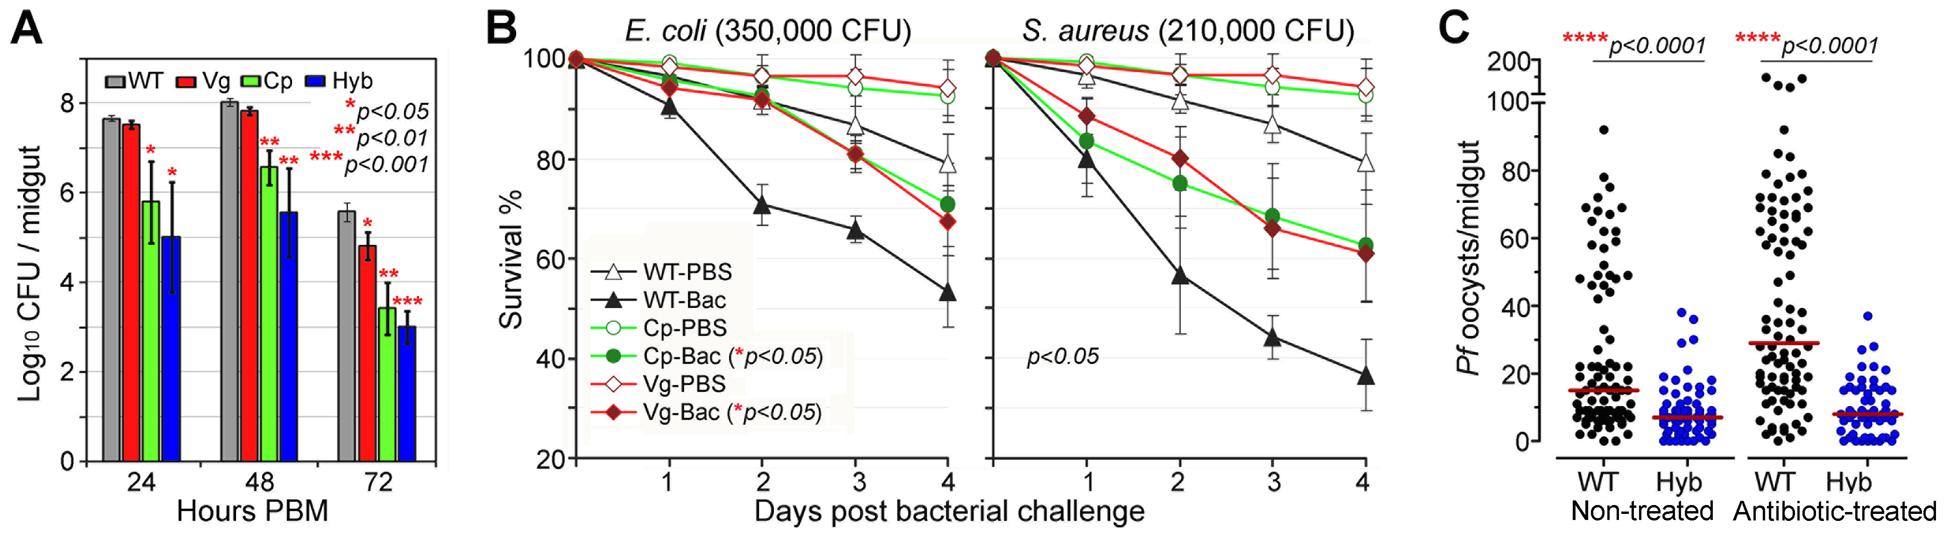 Antibacterial resistance of immune-enhanced transgenic mosquitoes.